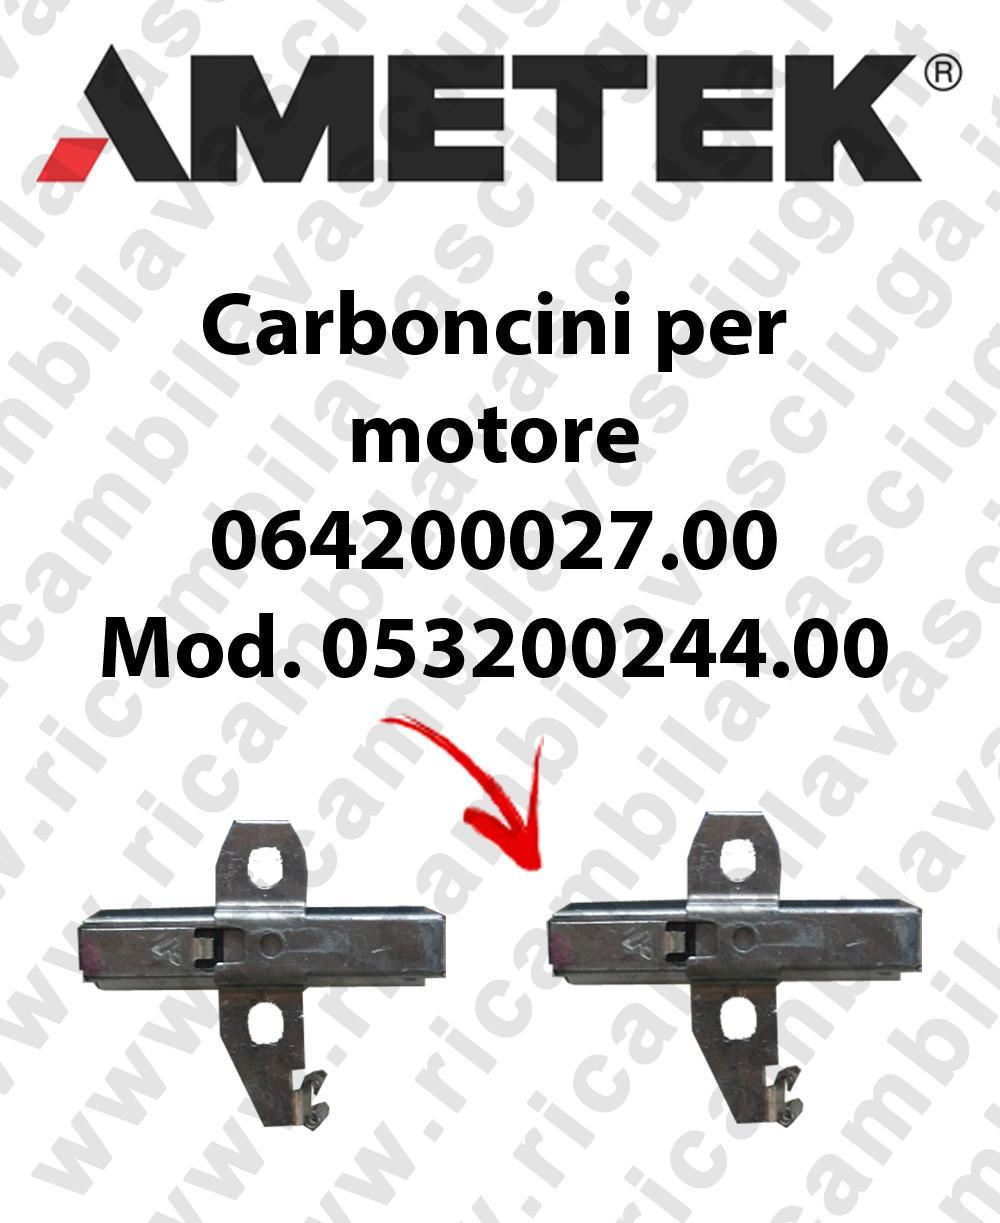 053200244.00 Paar Motorbürsten für motor Ametek 064200027